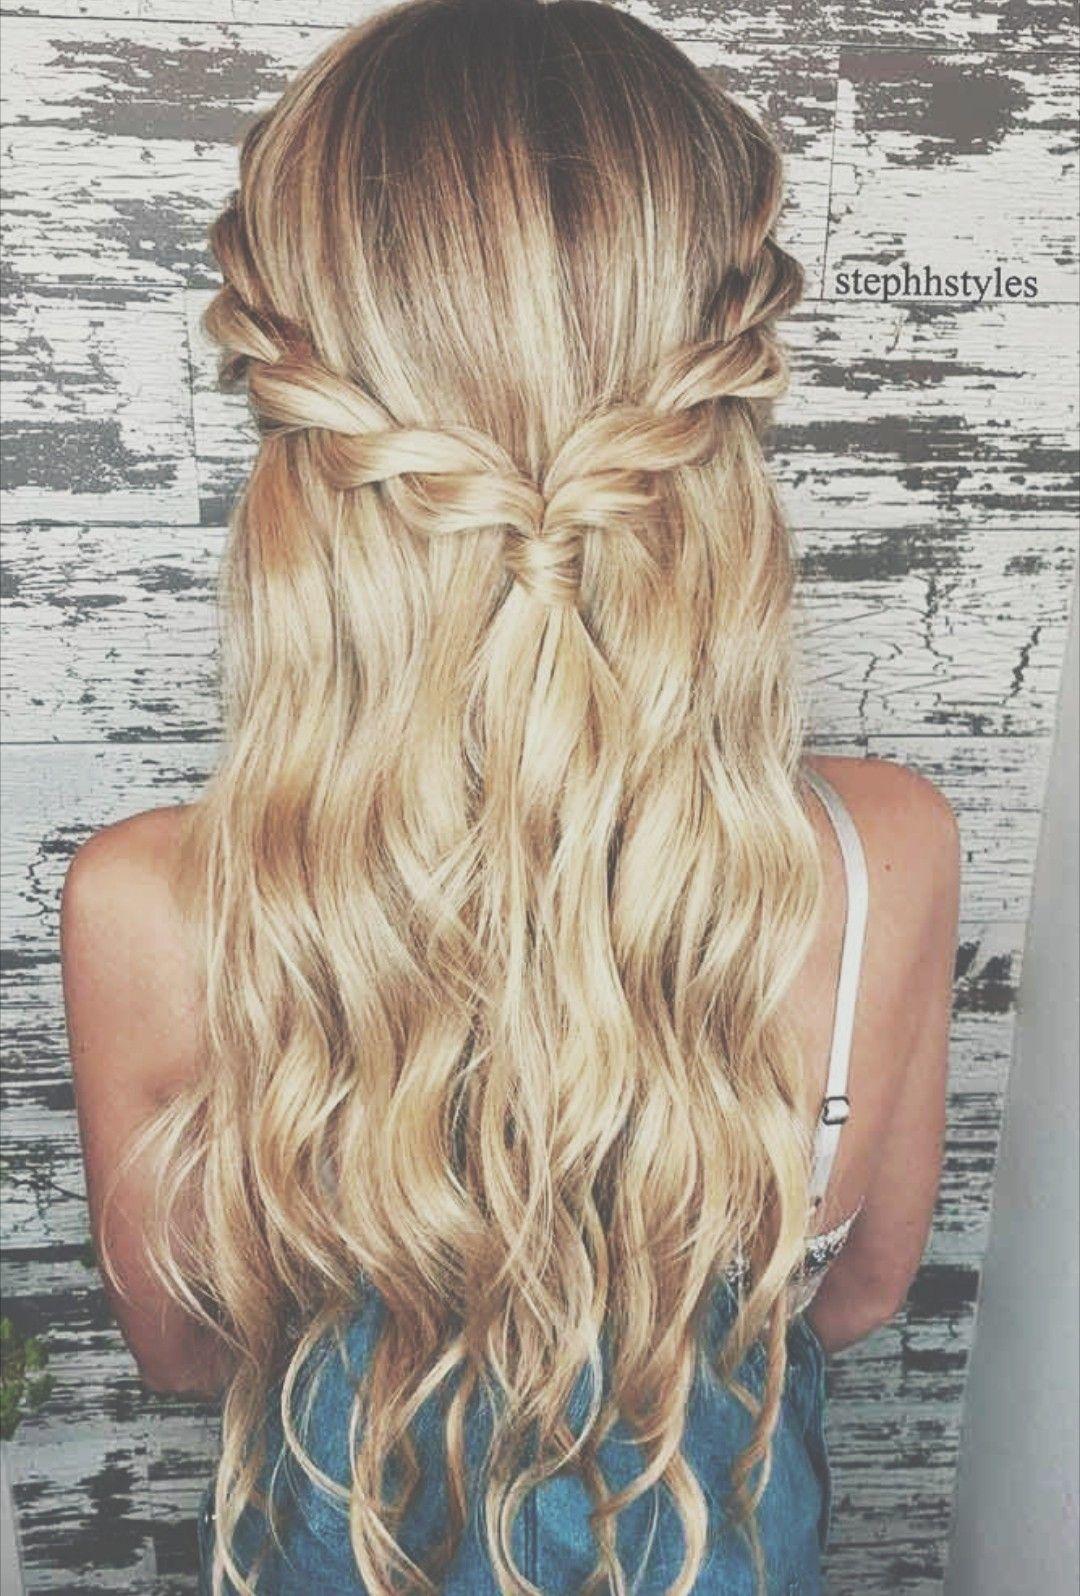 Long Hair Braid Long Hair Updo Long Hair Styles Braids For Long Hair